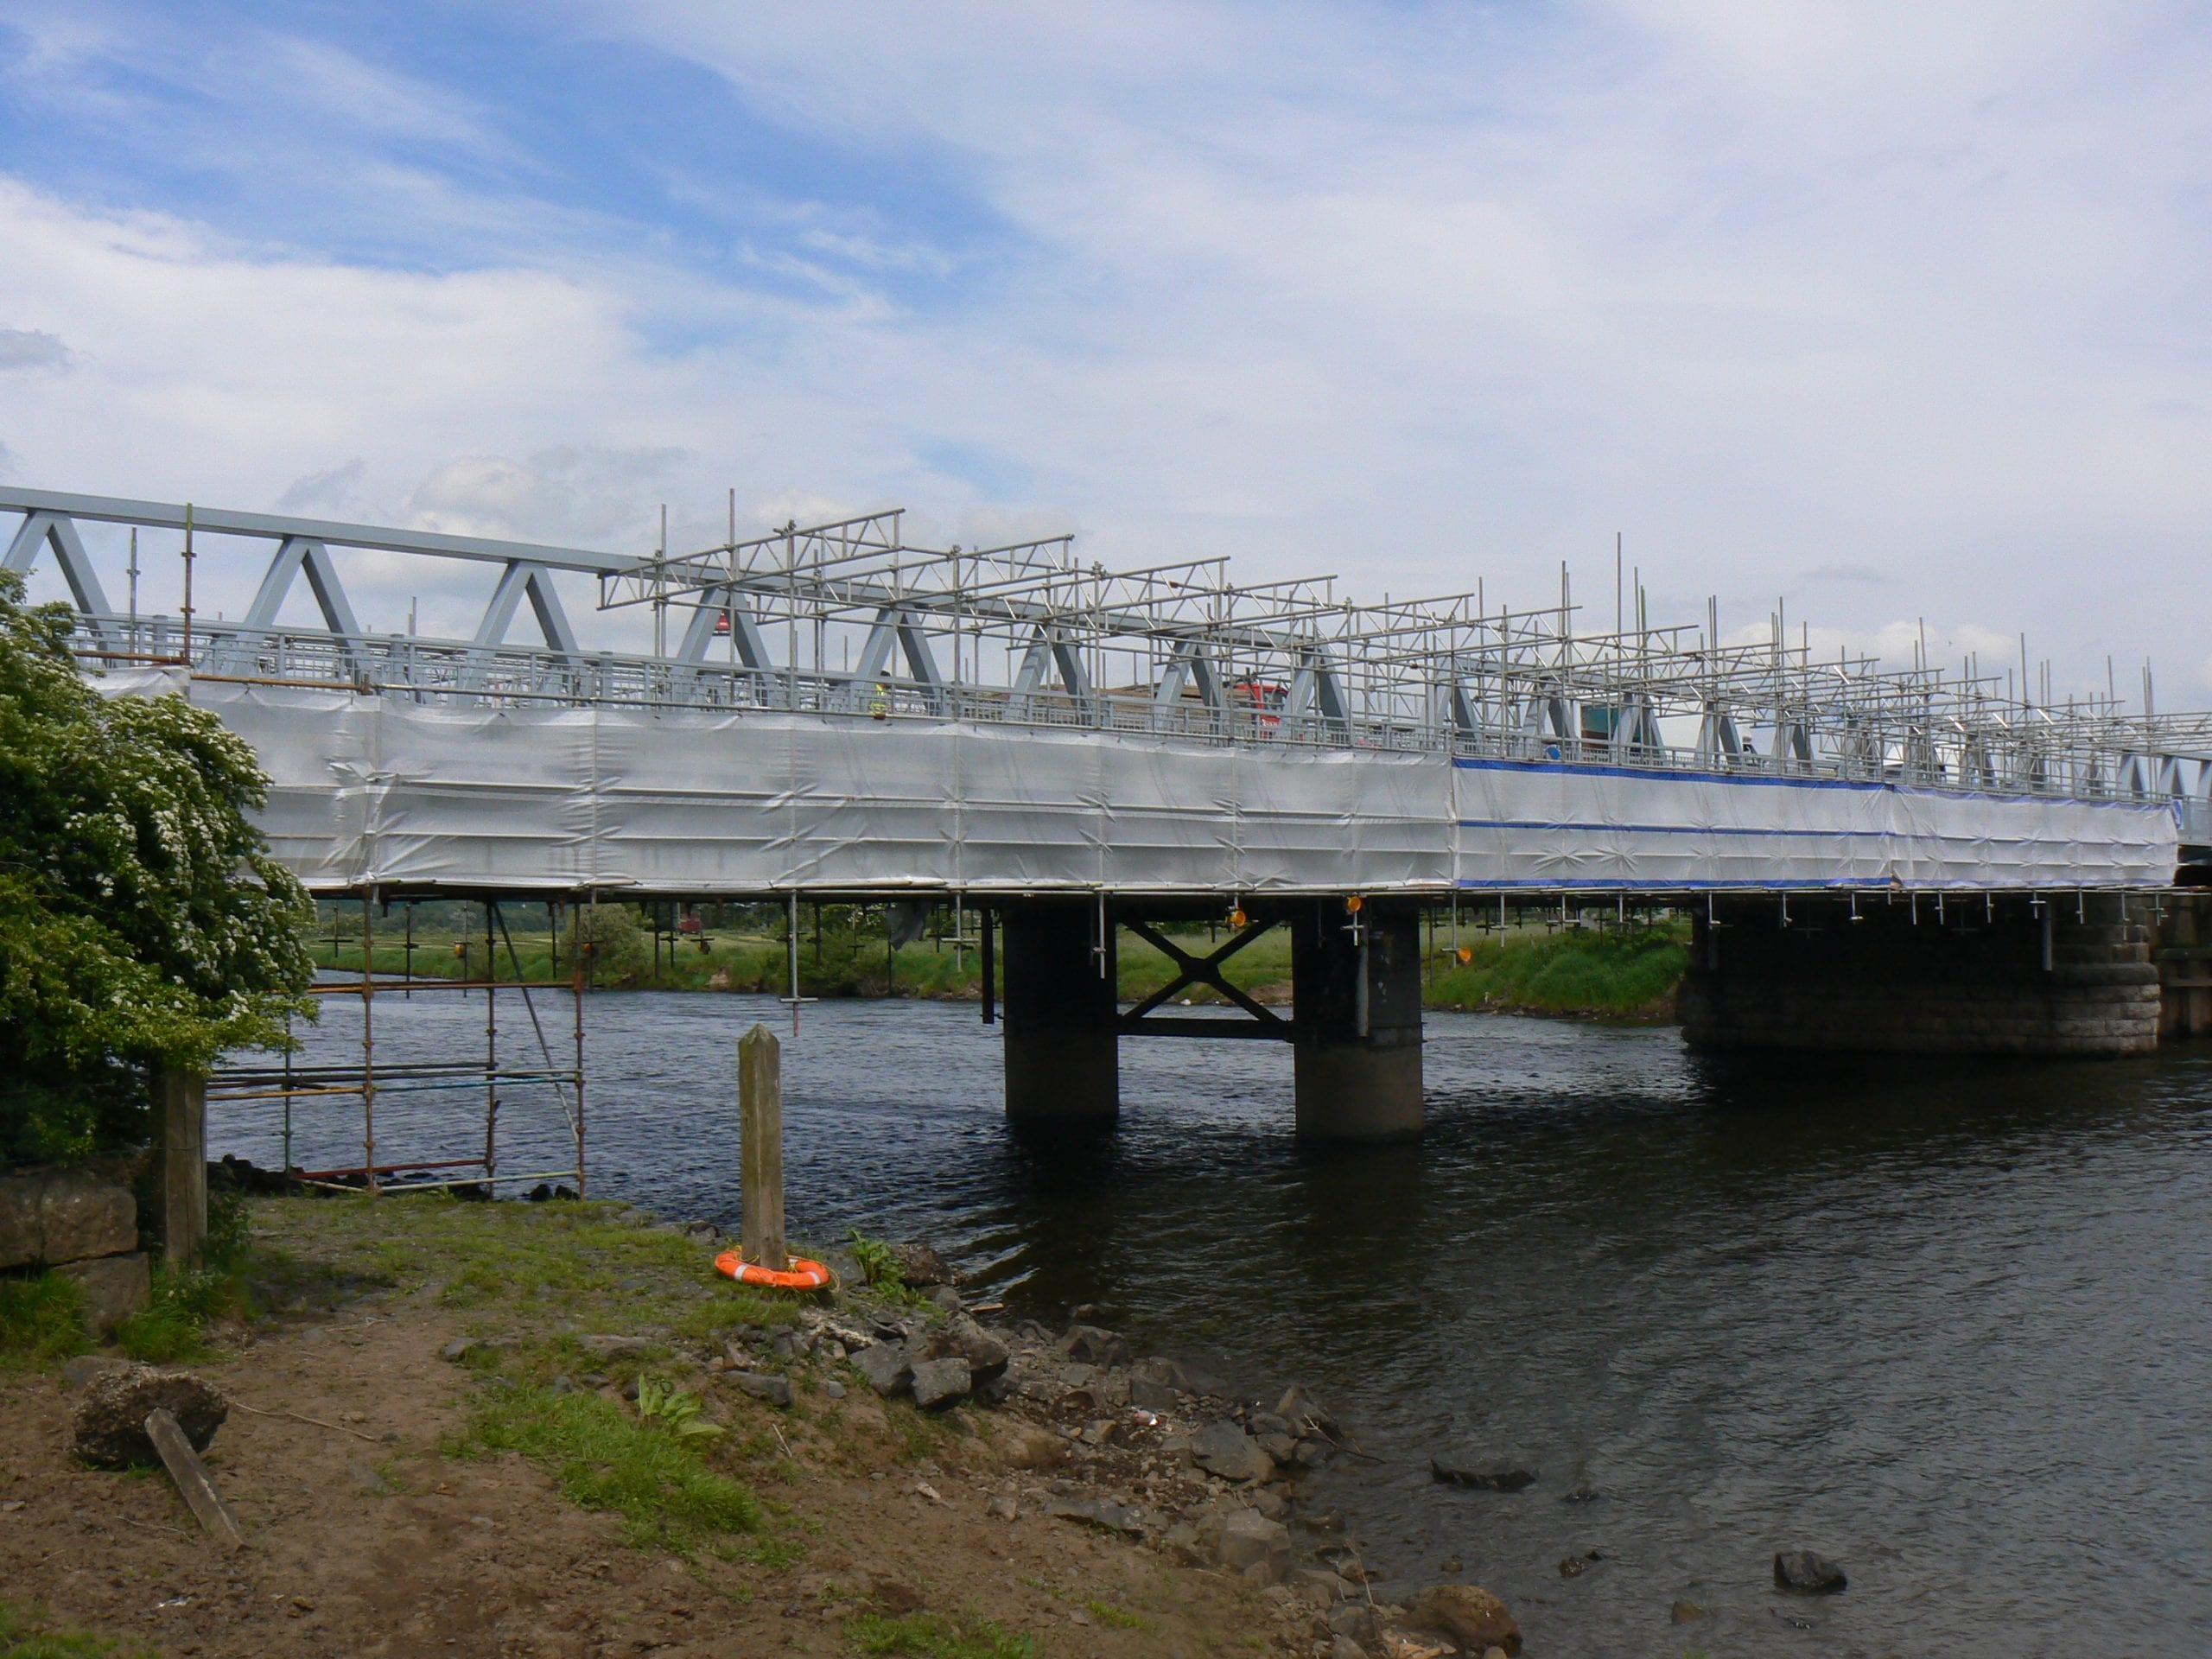 Toomebridge River Bann Featured Image